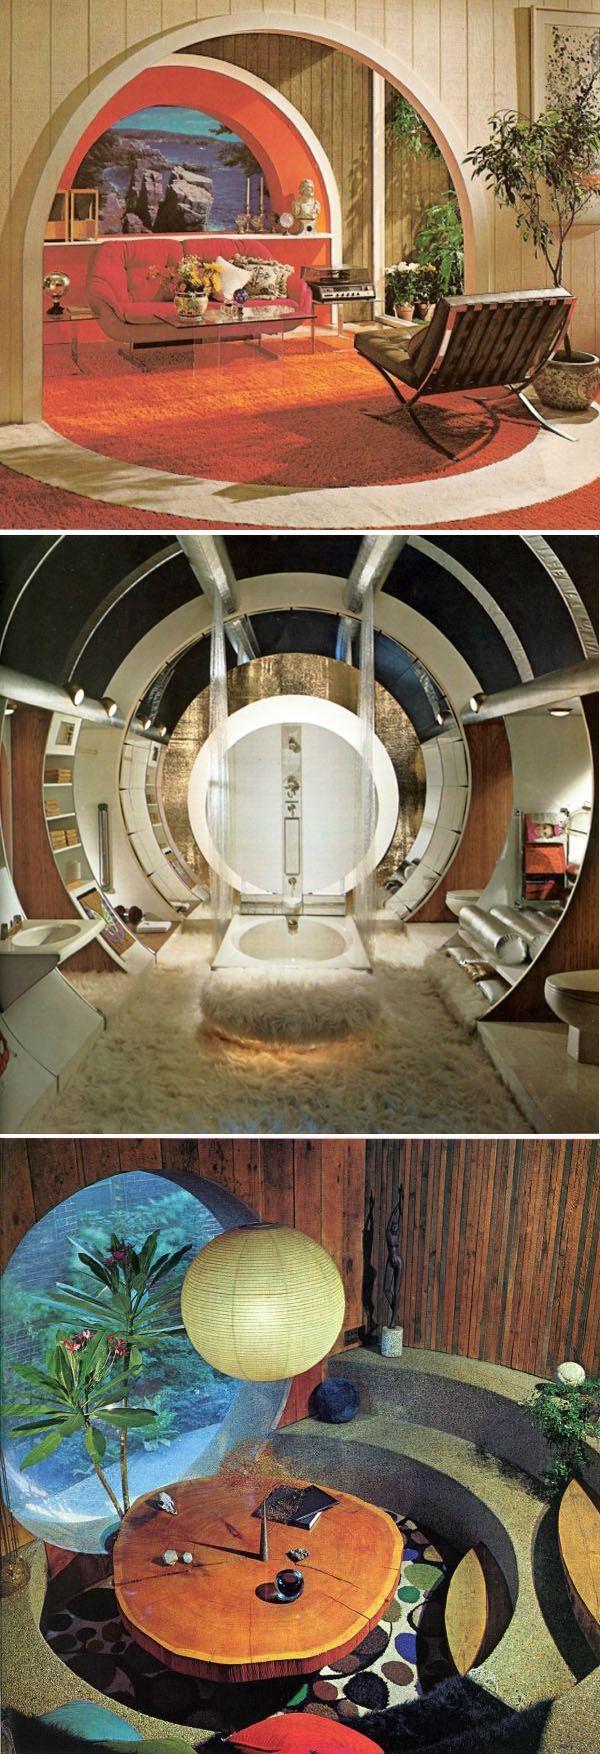 1960's & 70's home interiors - soooo cool! Love the bathroom!!